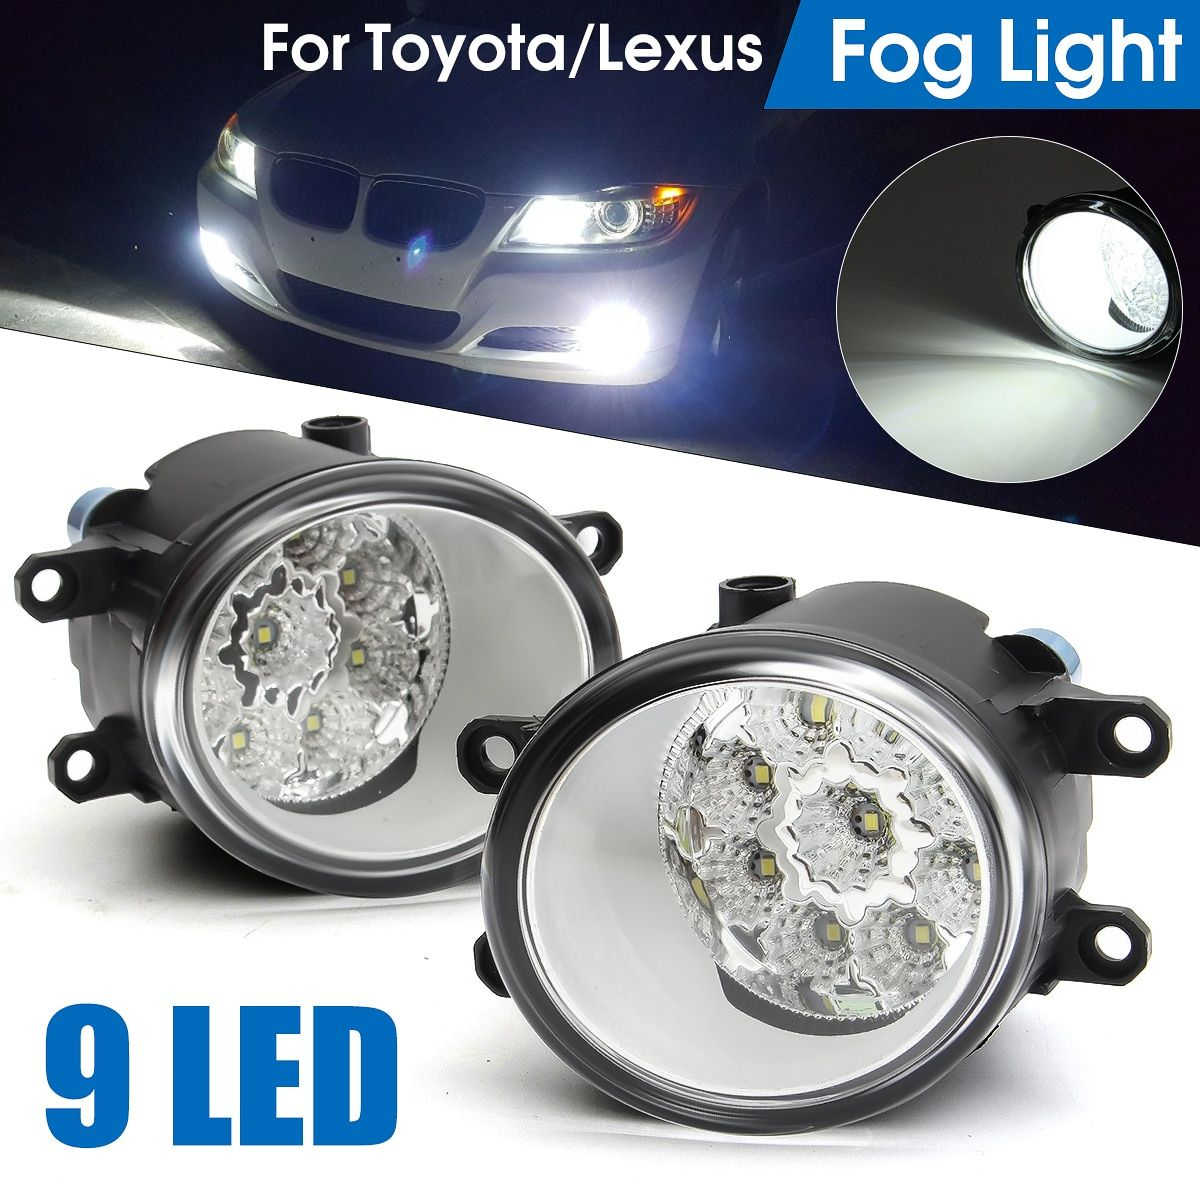 2Pcs Round Front LED Car Fog Light Lamp for Toyota Camry Corolla 2009-2013 Yaris 2006-2013 RAV4 2006-2012 for Lexus RX350/RX450